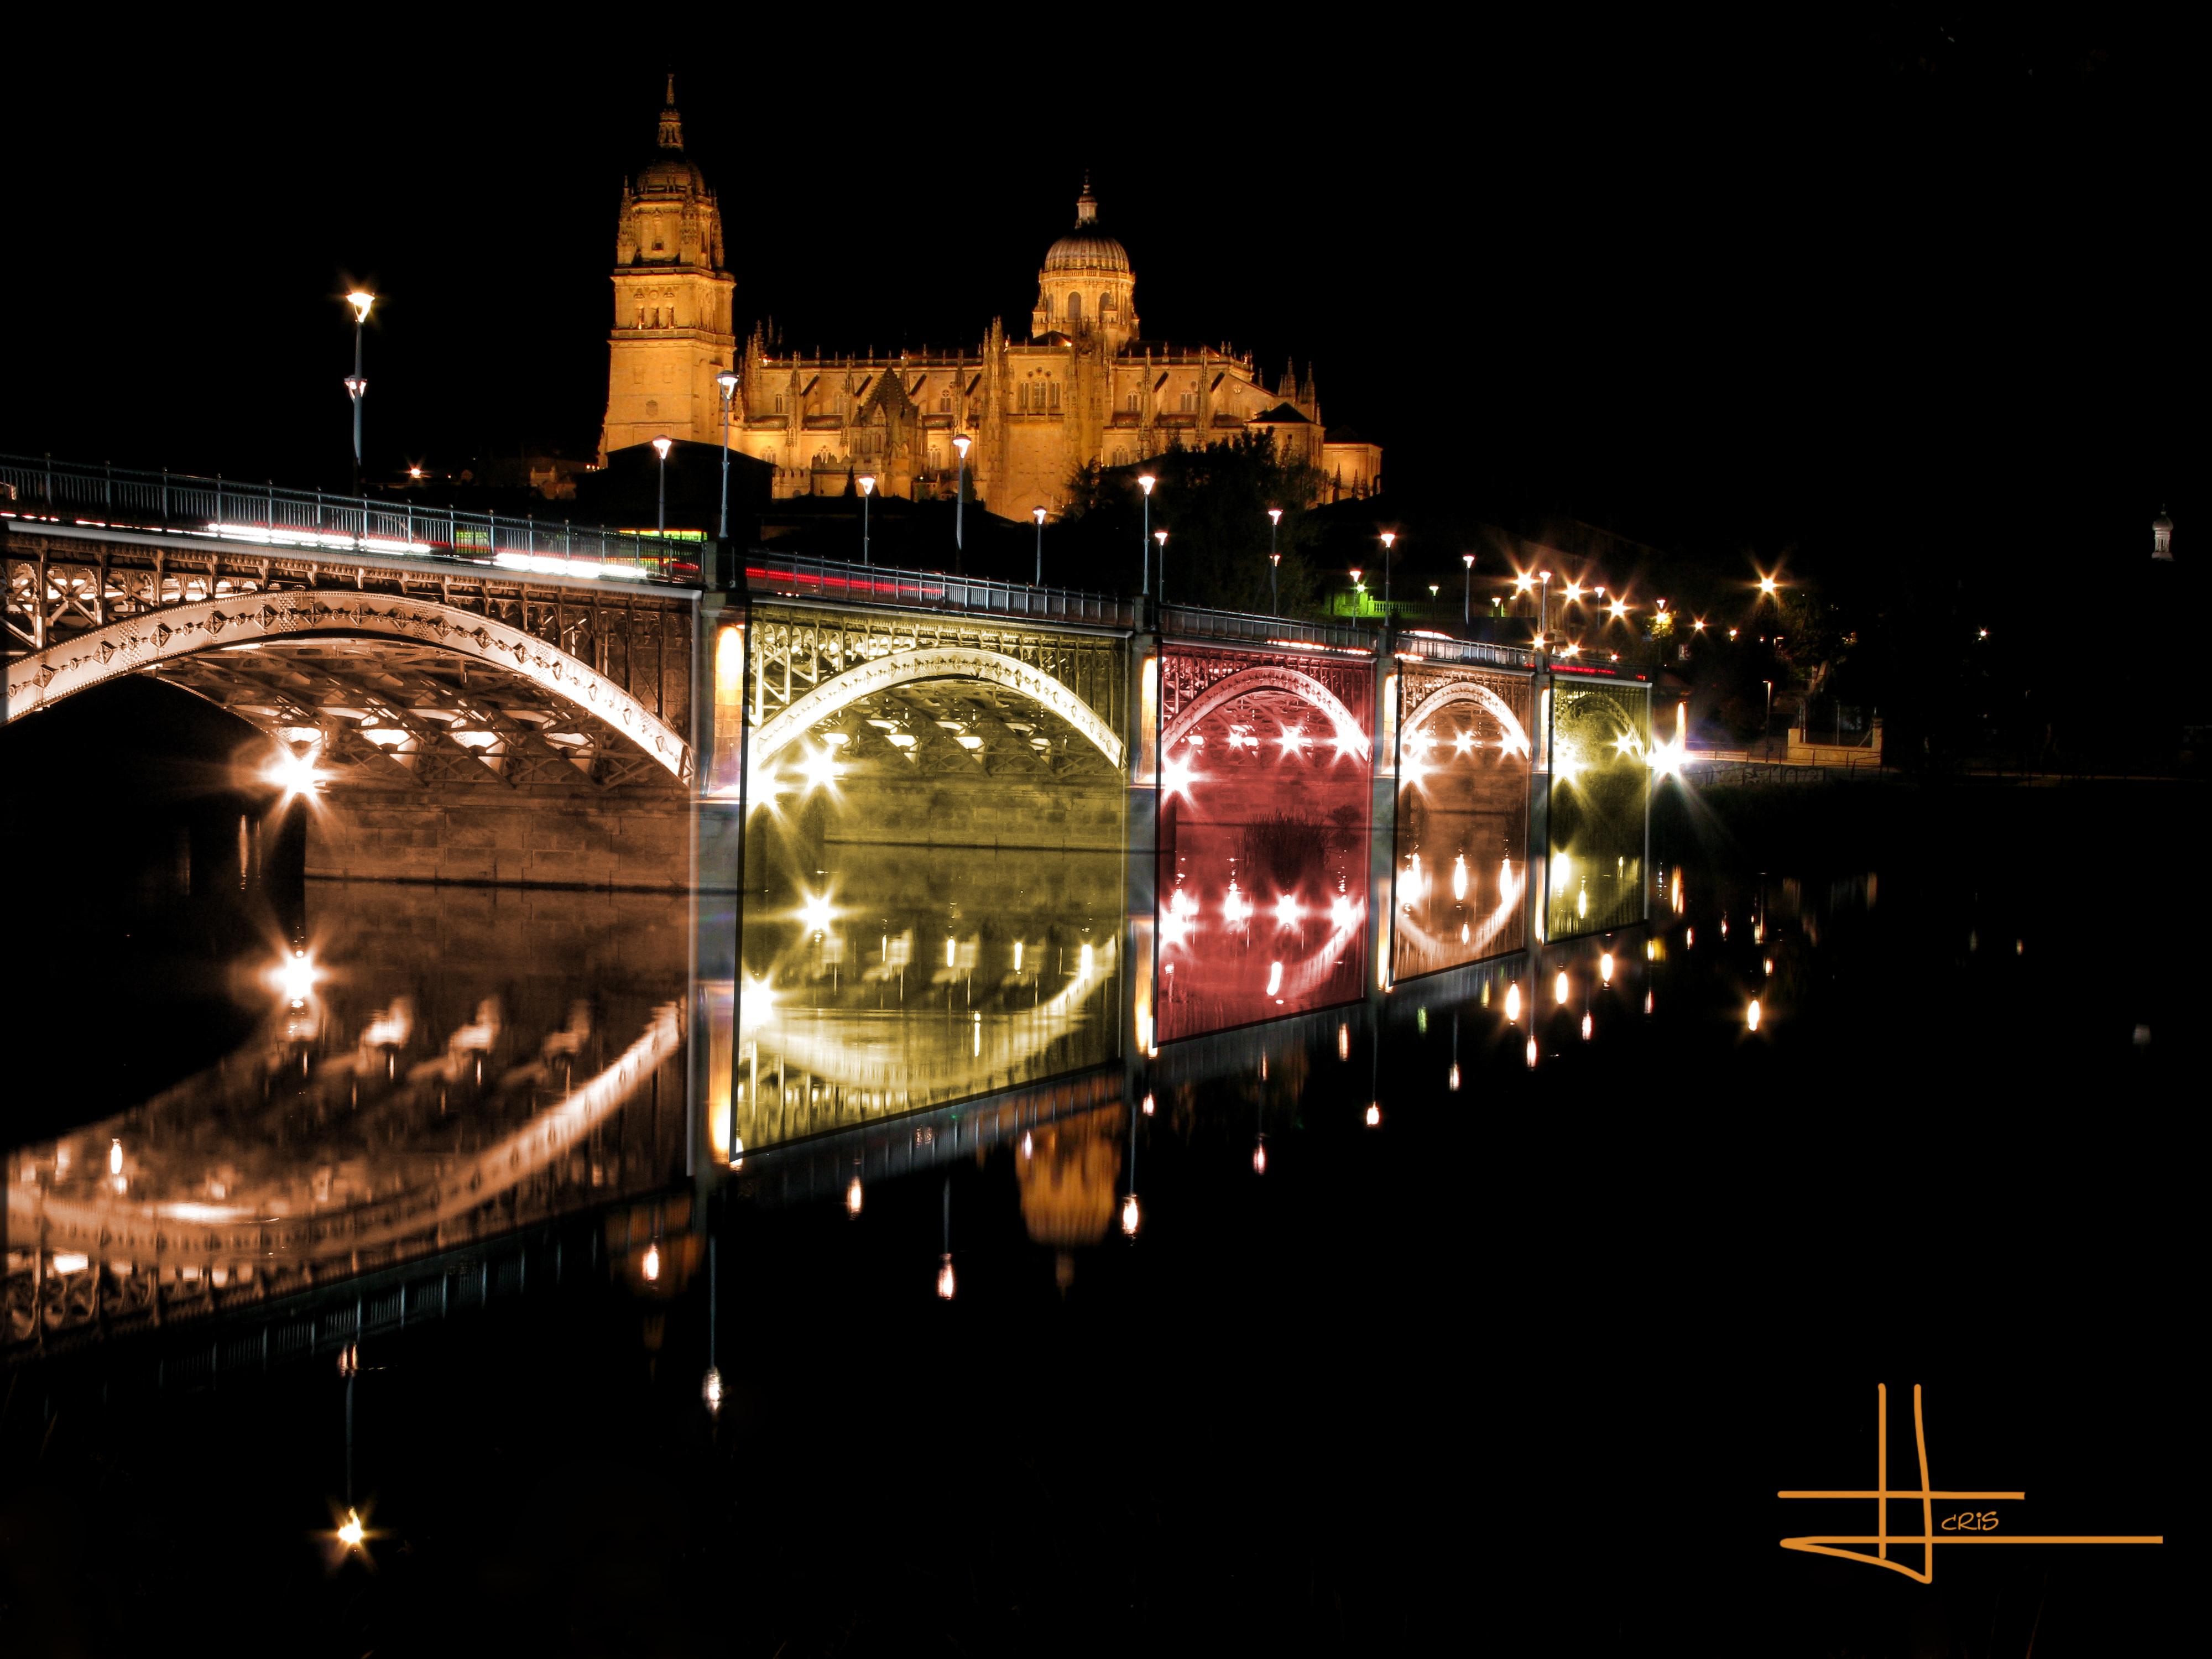 Wallpaper Lighting Bridge Detalle Art Water Glass